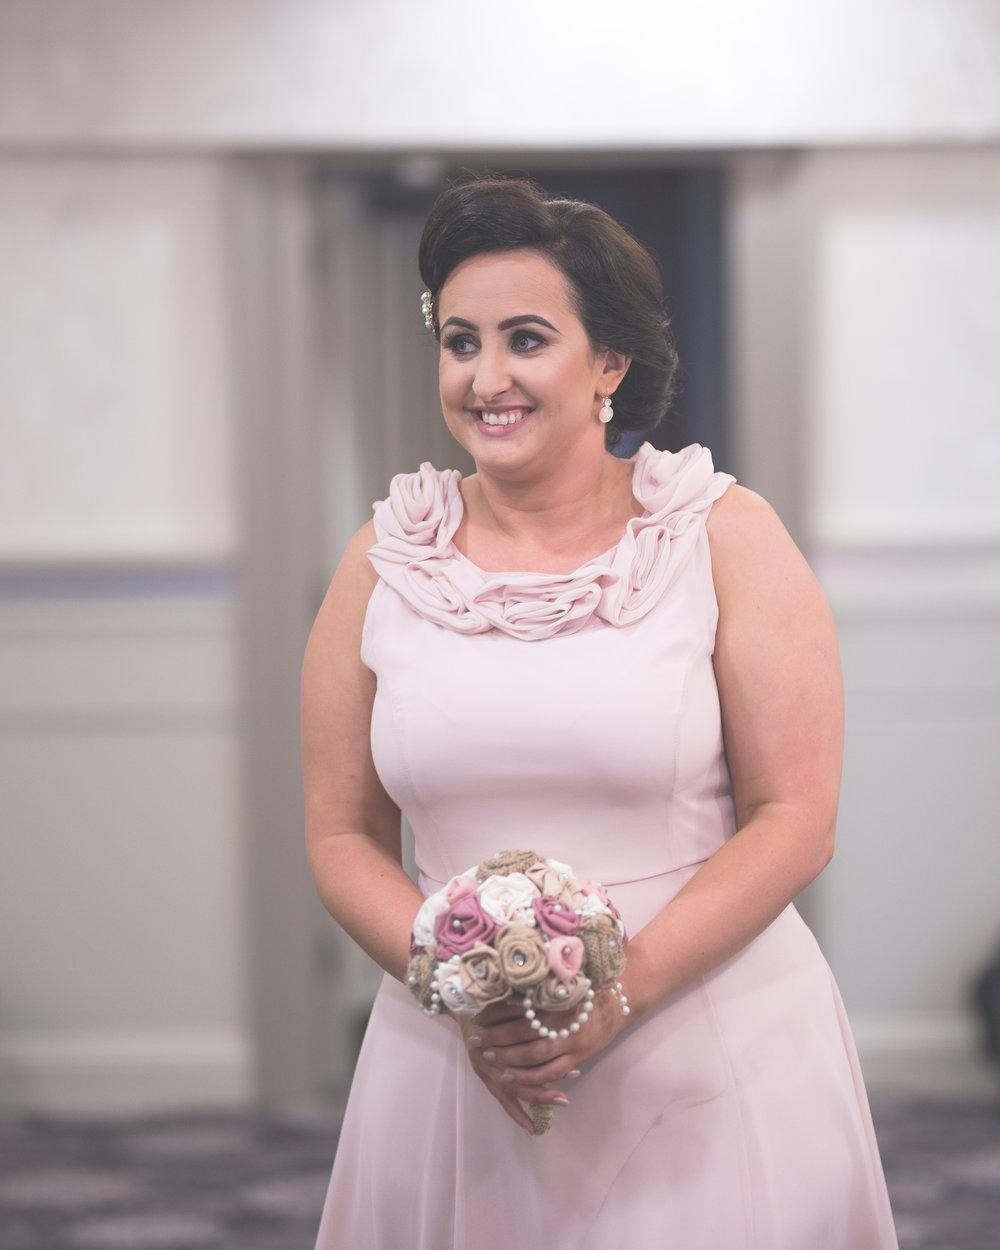 Antoinette & Stephen - Ceremony | Brian McEwan Photography | Wedding Photographer Northern Ireland 39.jpg